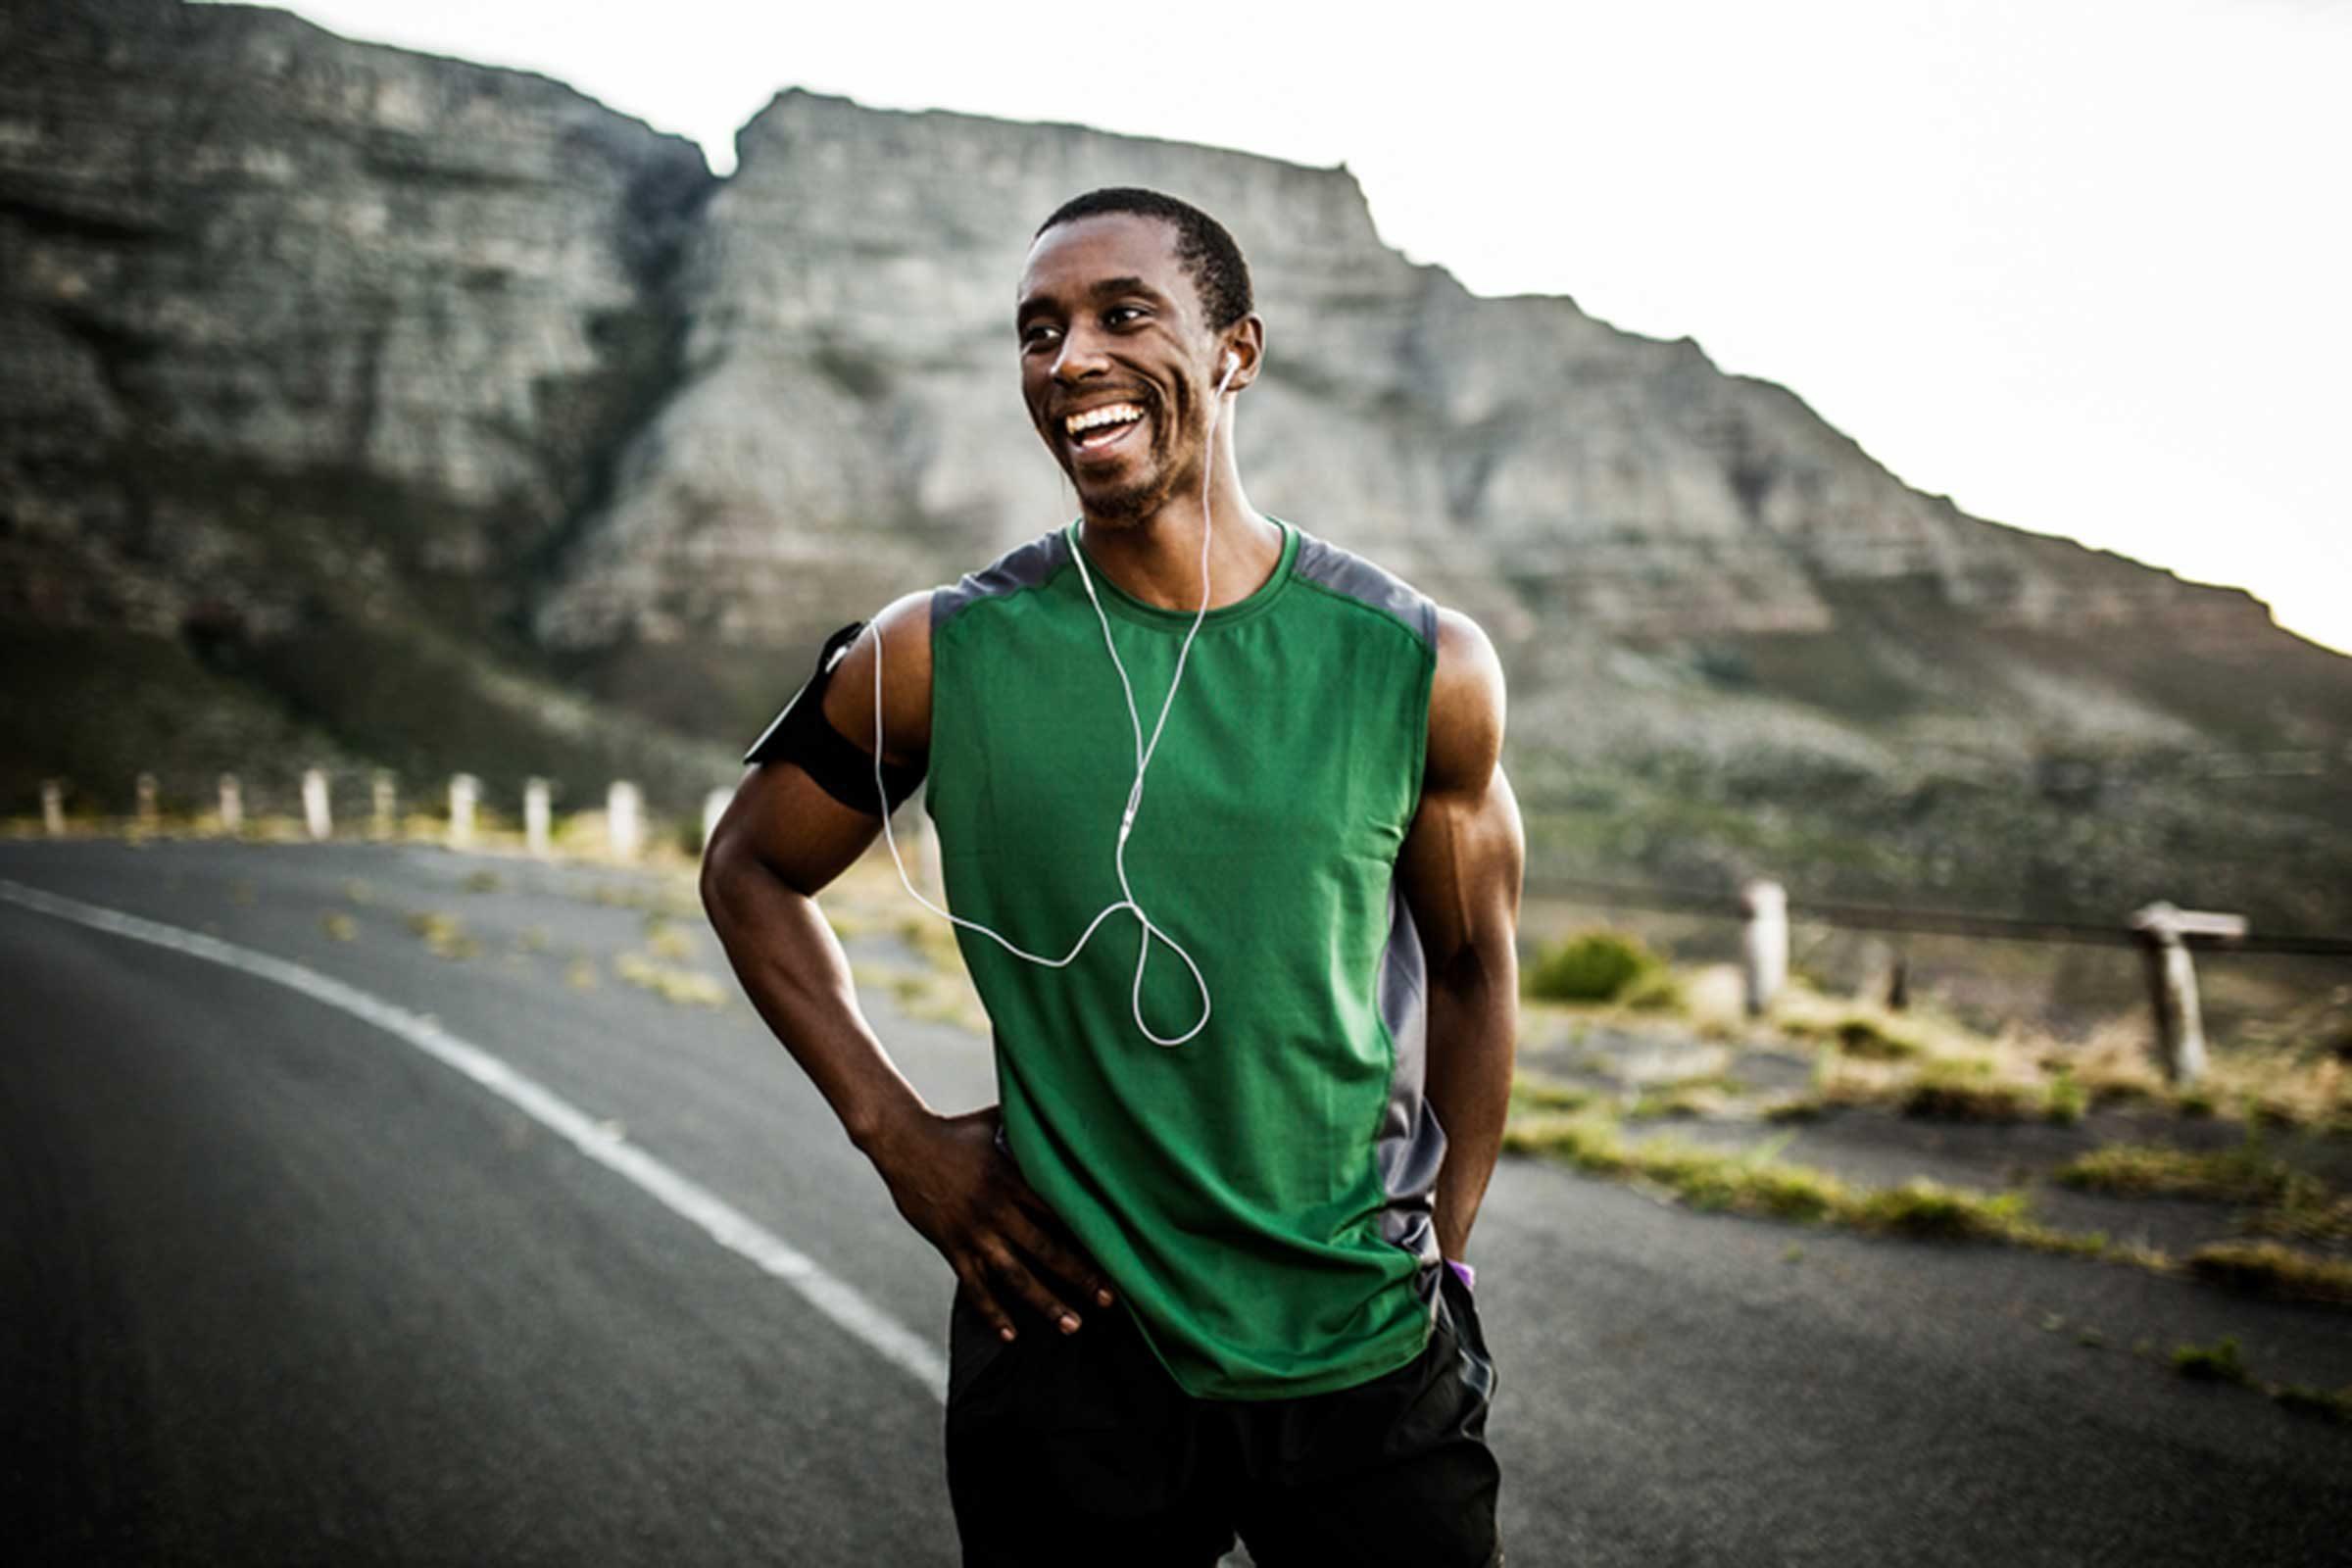 Man smiling during a run